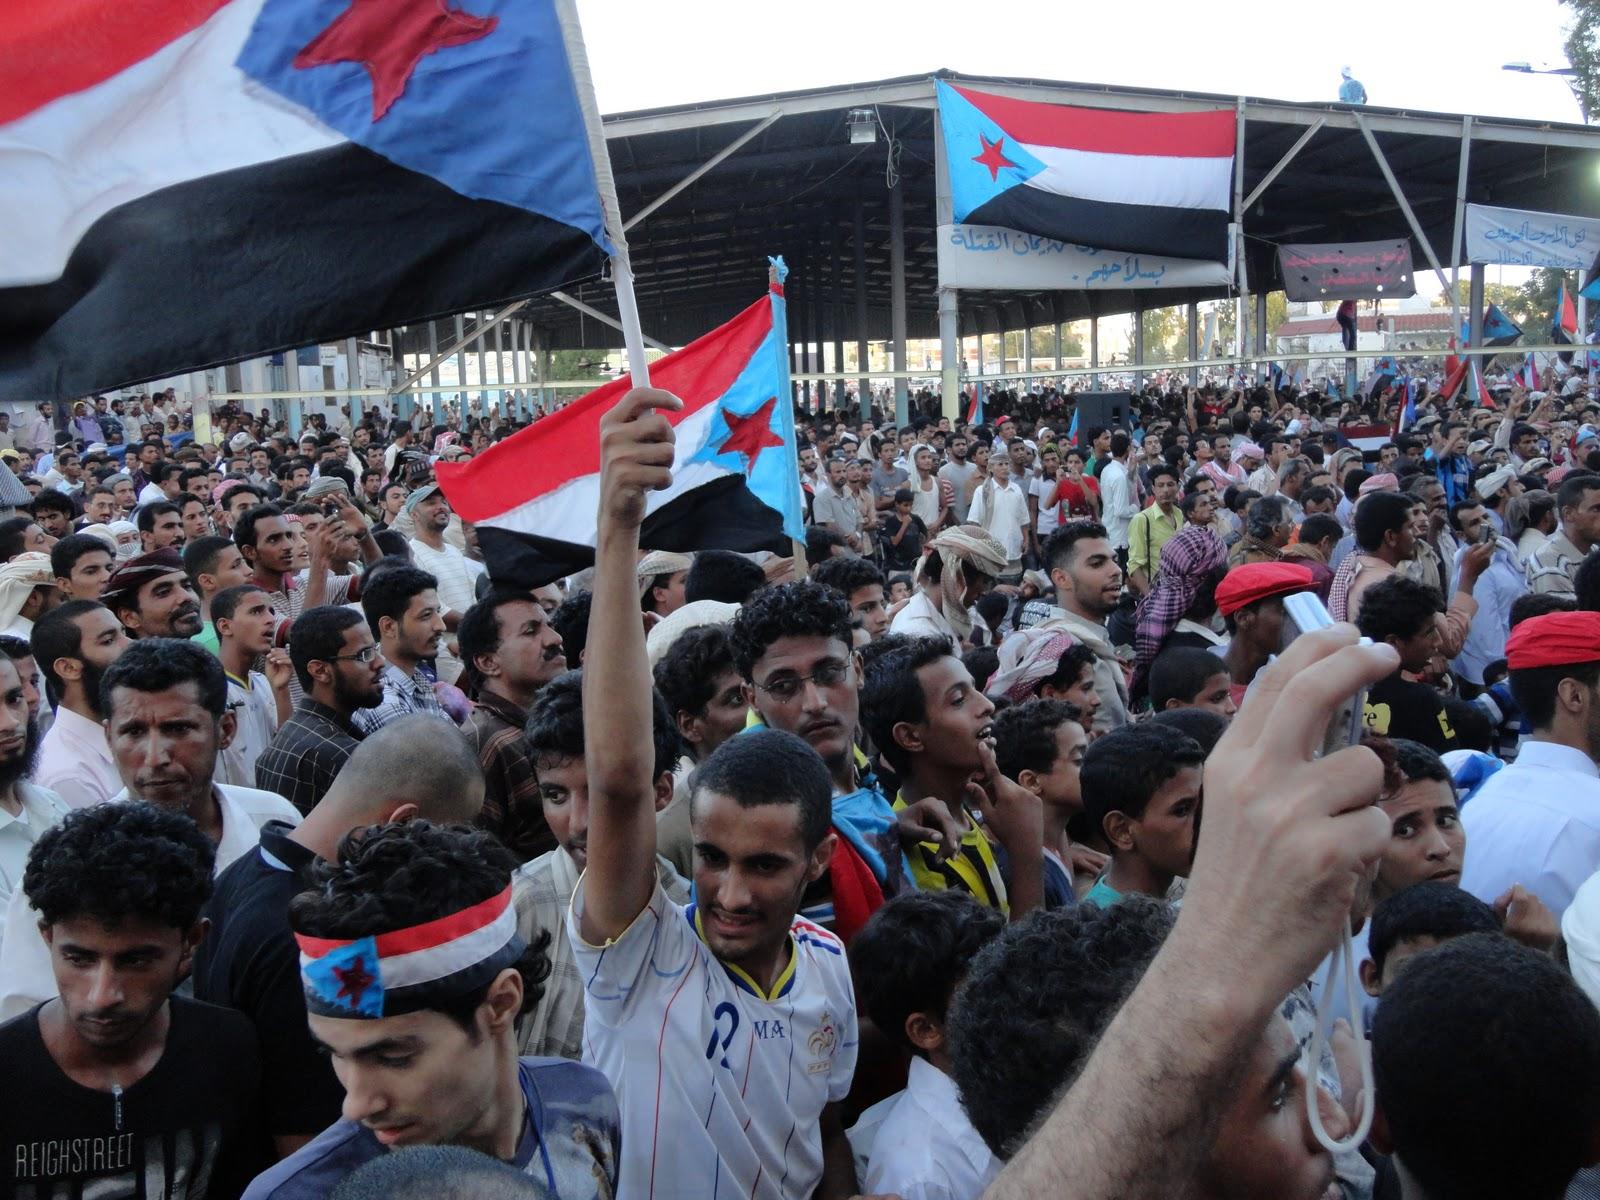 File:Protest Aden Arab Spring 2011.jpg - Wikimedia Commons